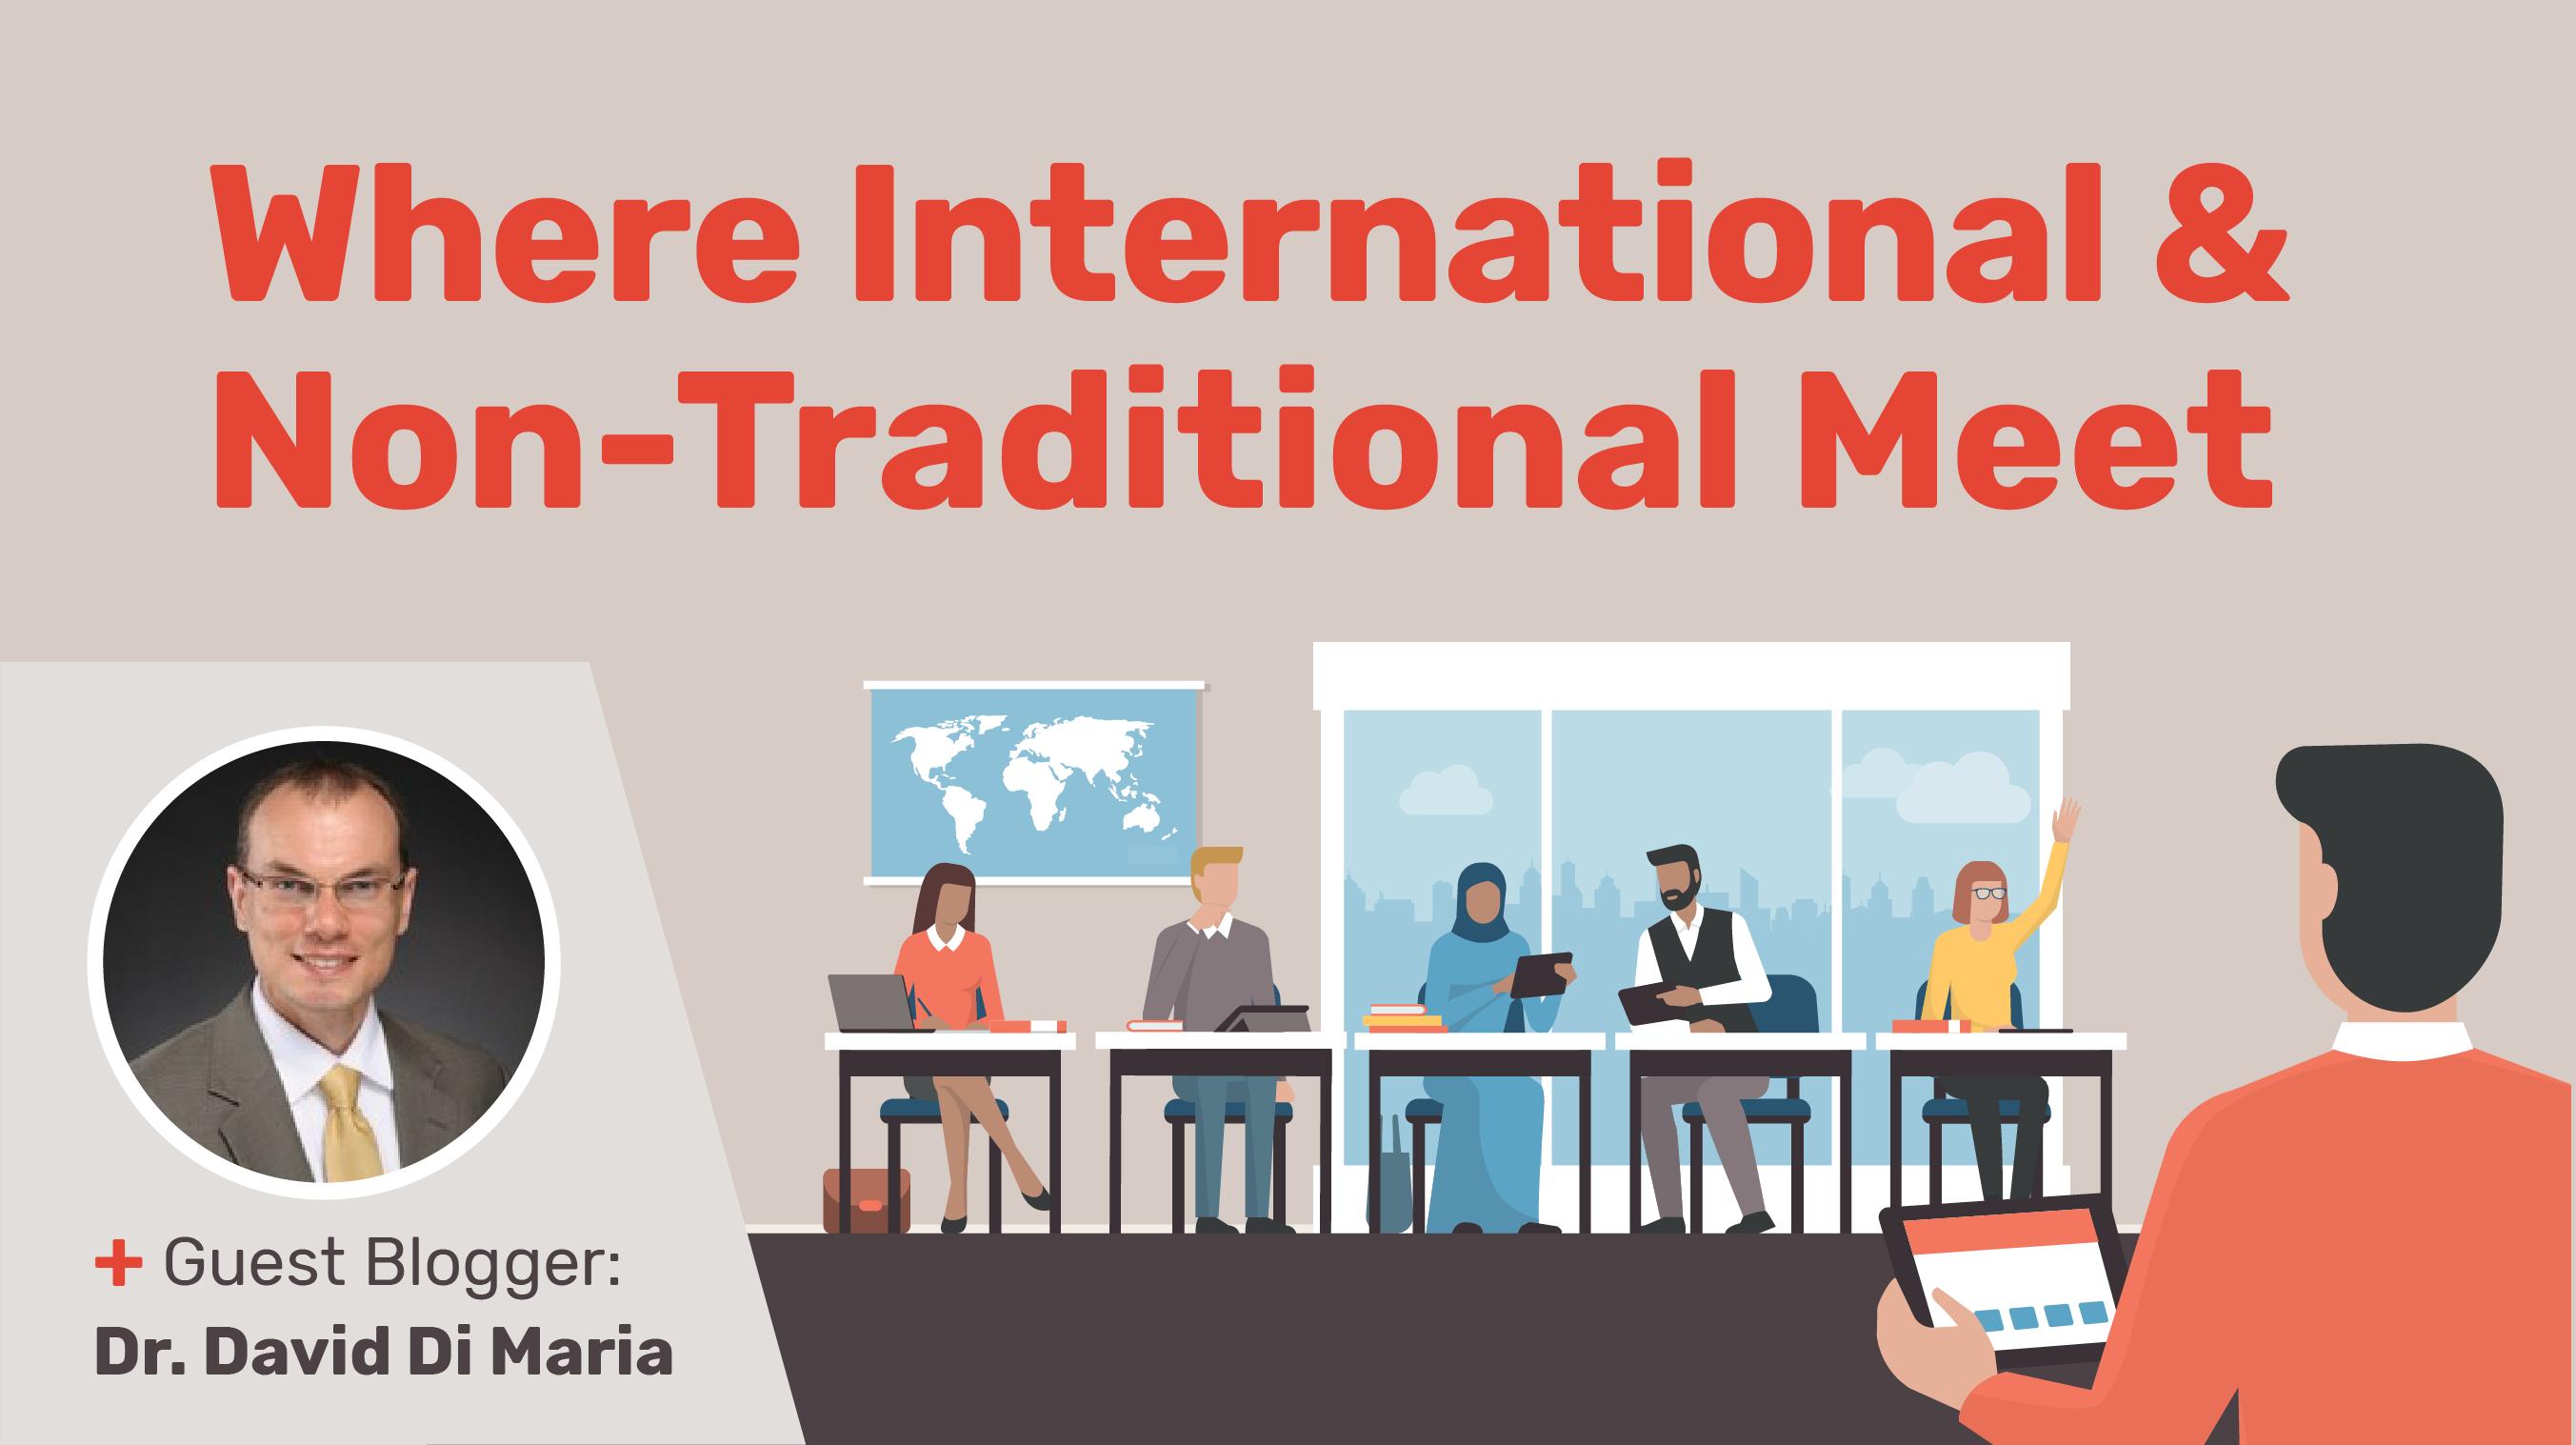 Where International & Non-Traditional Meet